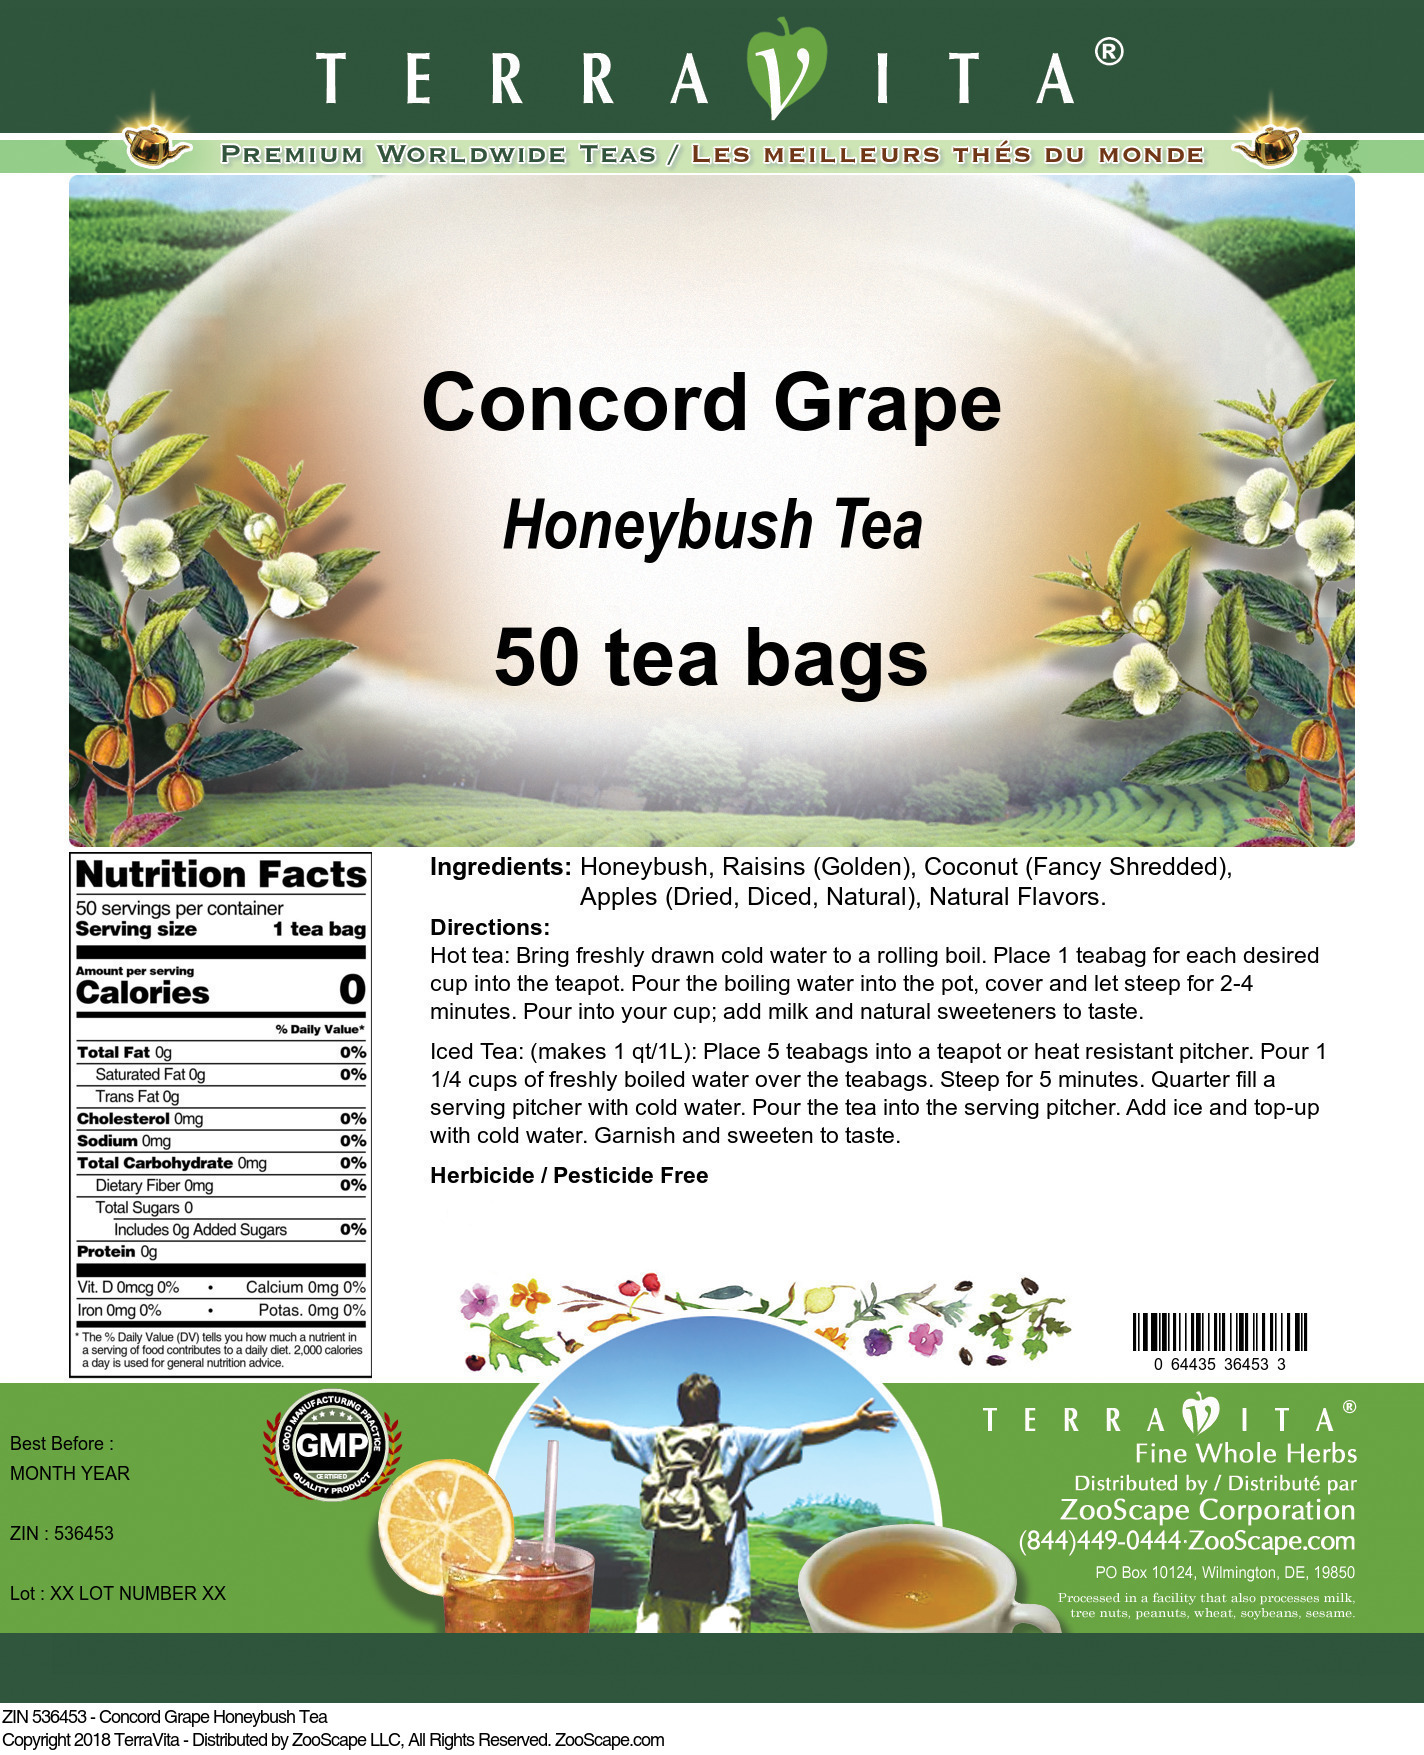 Concord Grape Honeybush Tea